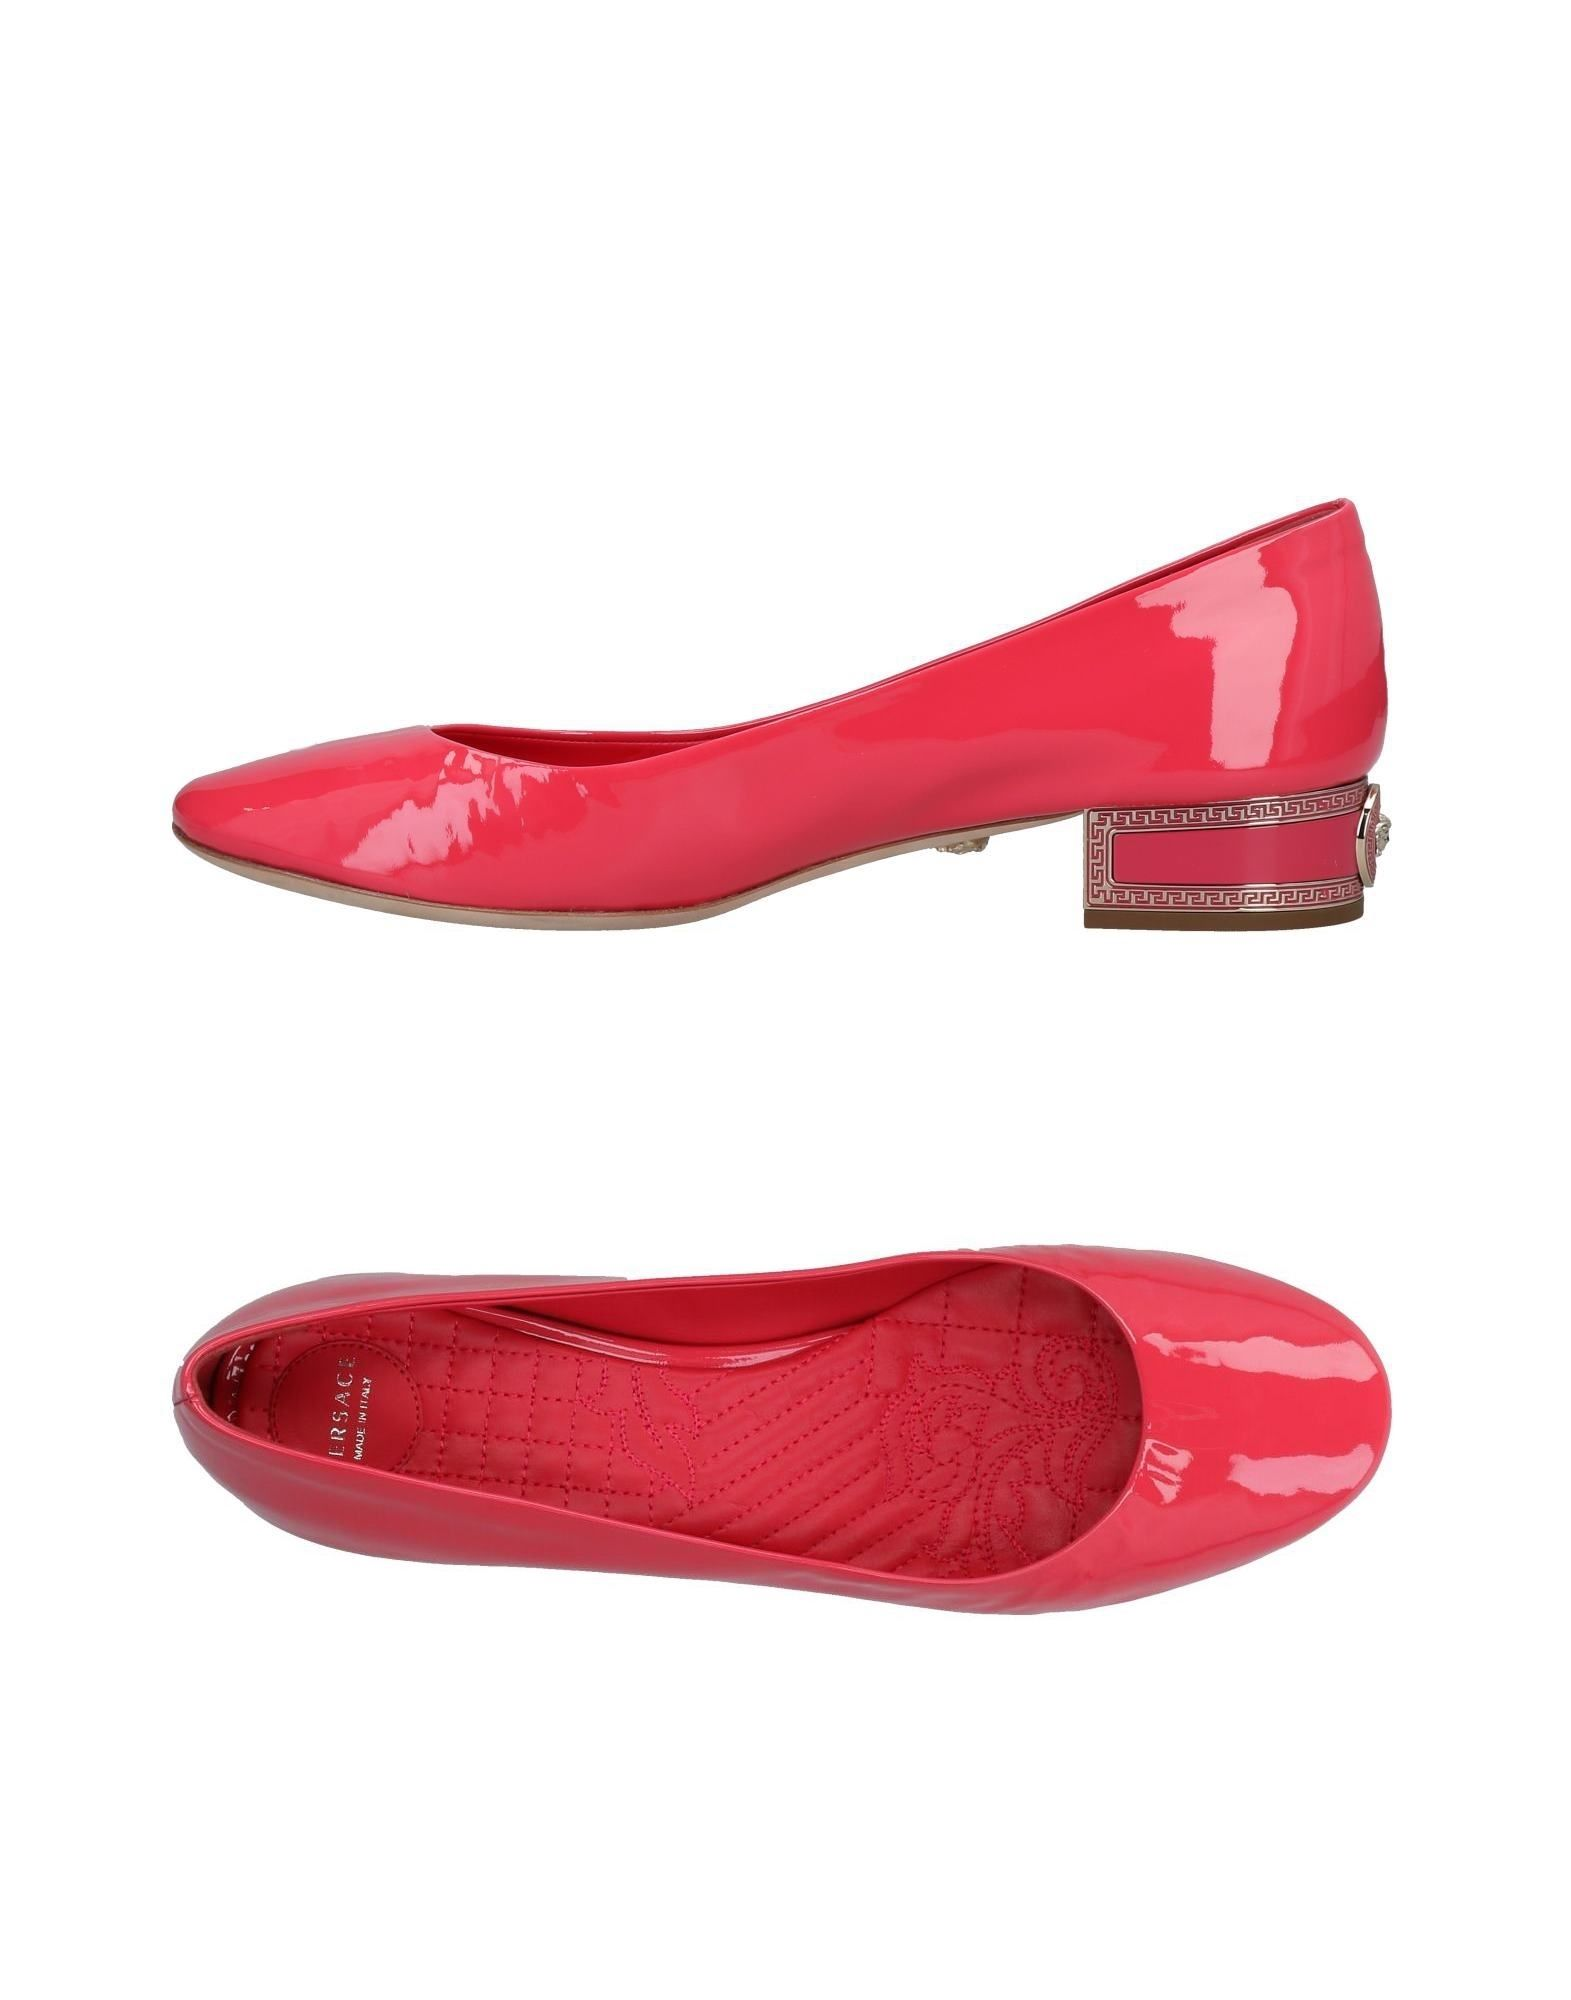 Scarpe economiche e resistenti Décolleté Versace Donna - 11488635CI